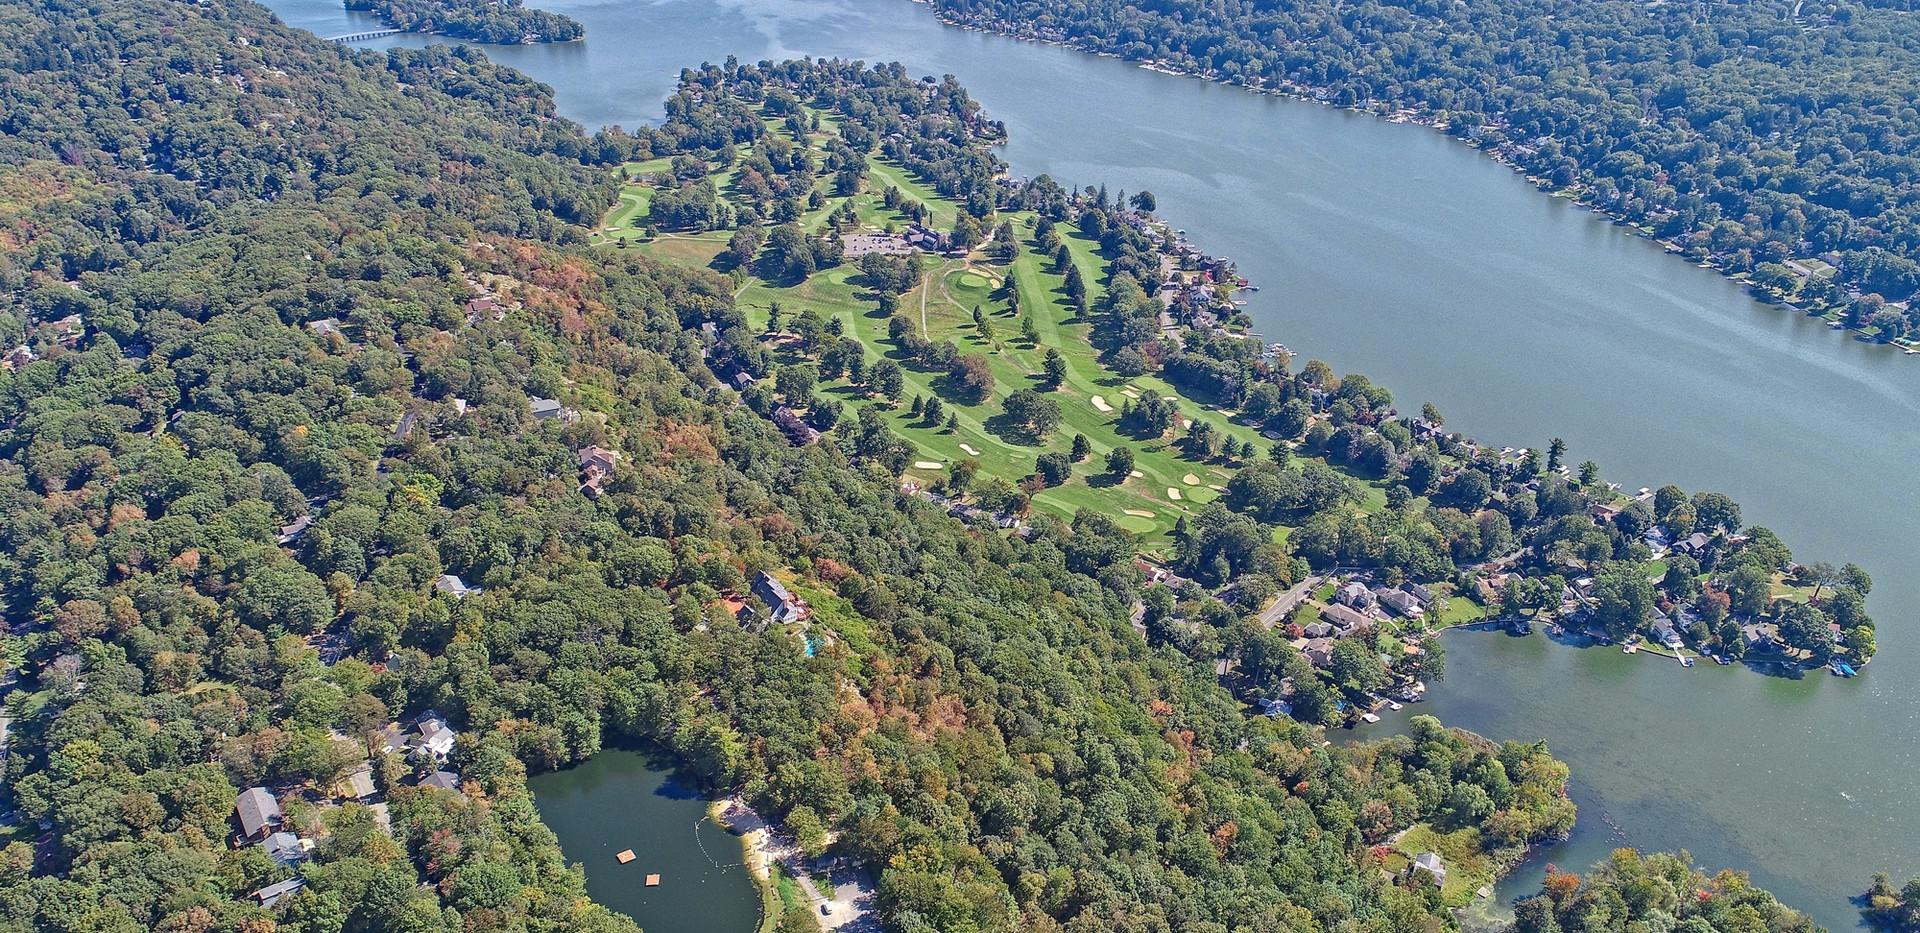 Lake Mohawk 212 Alpine - Drone 0066.jpg